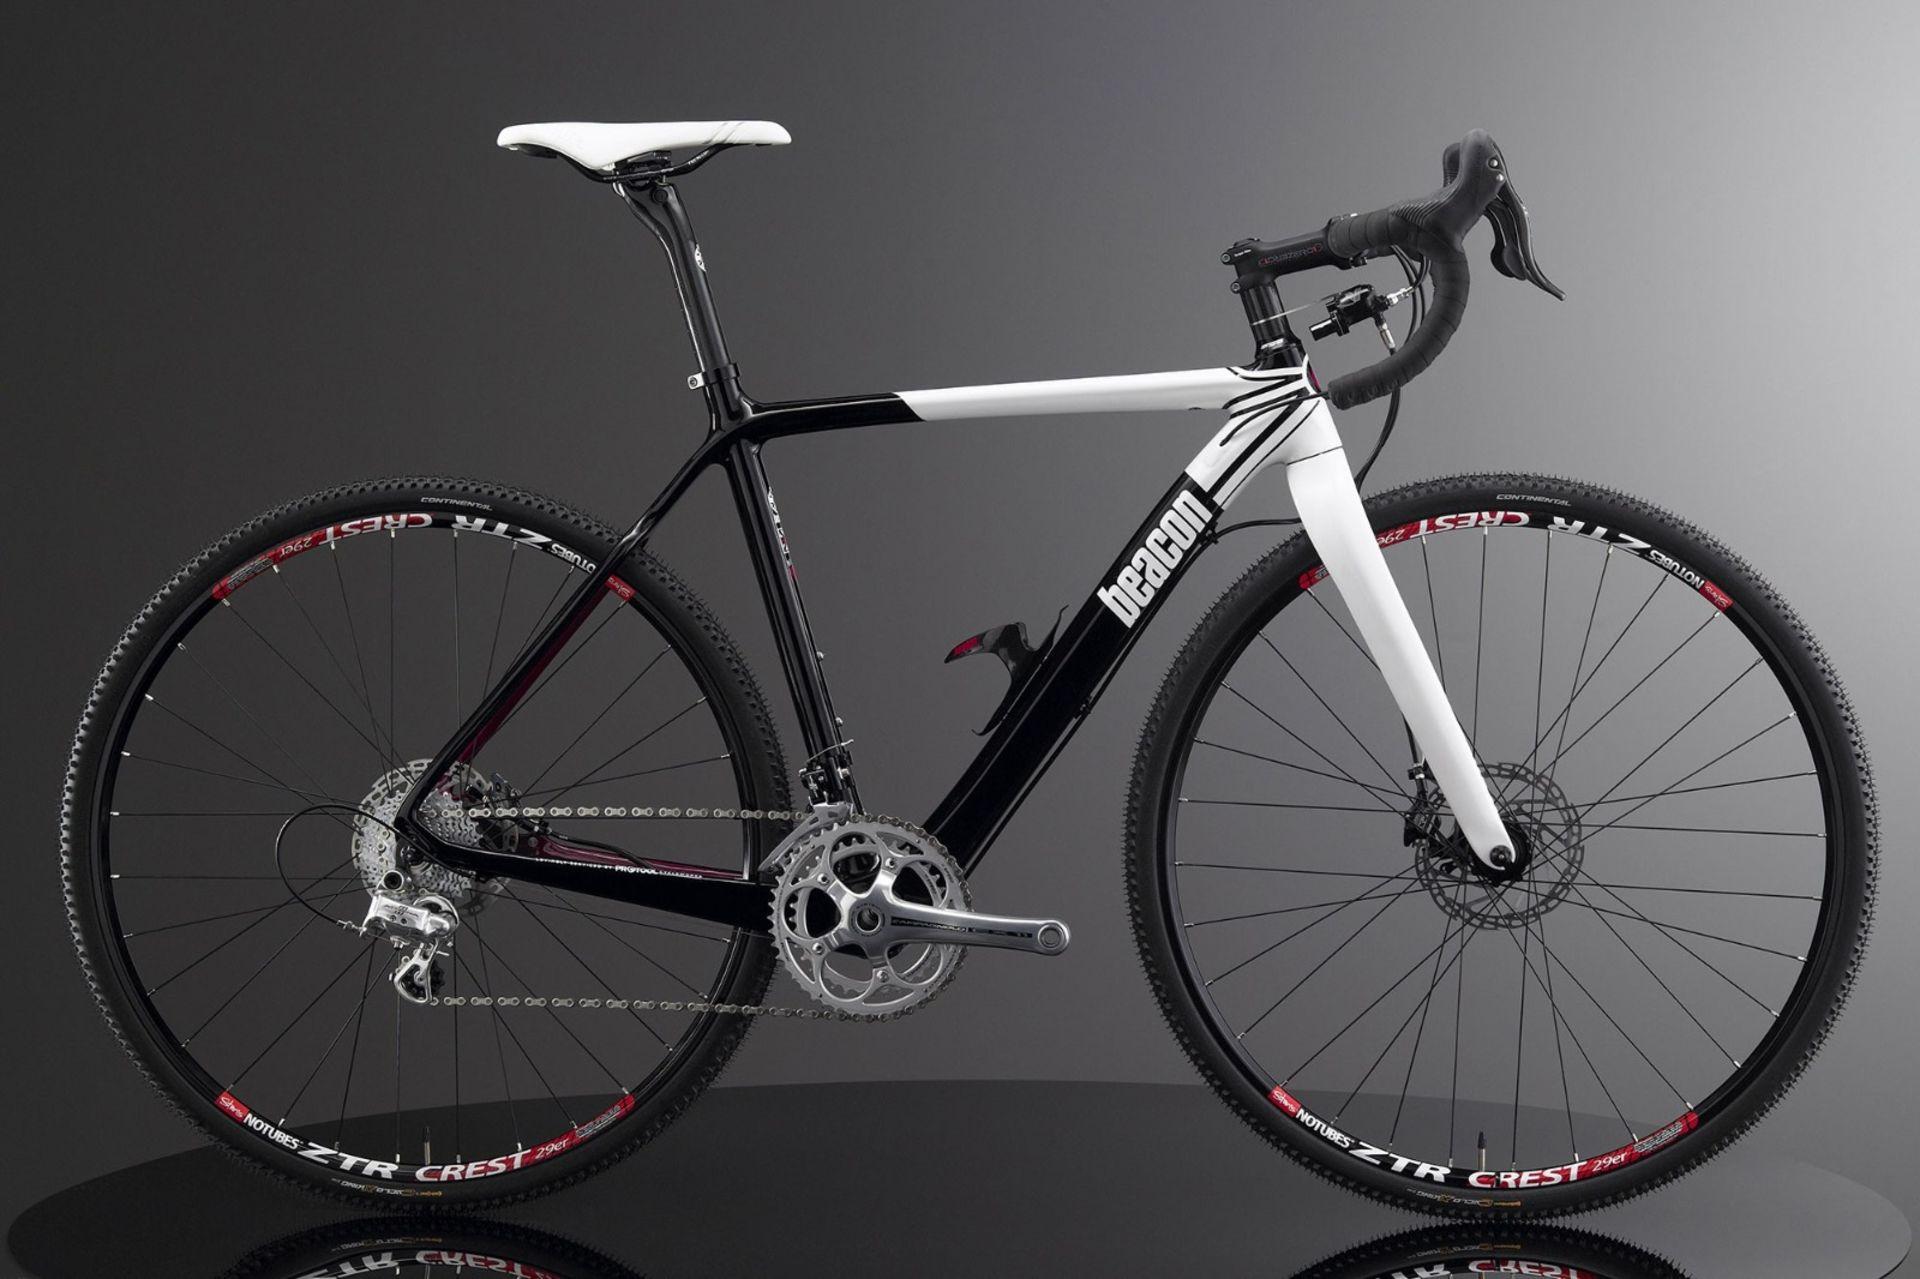 Lot 13 - 1 x Beacon Model BF-45, Size 540, Carbon Fibre Bike Frame in Black & White.